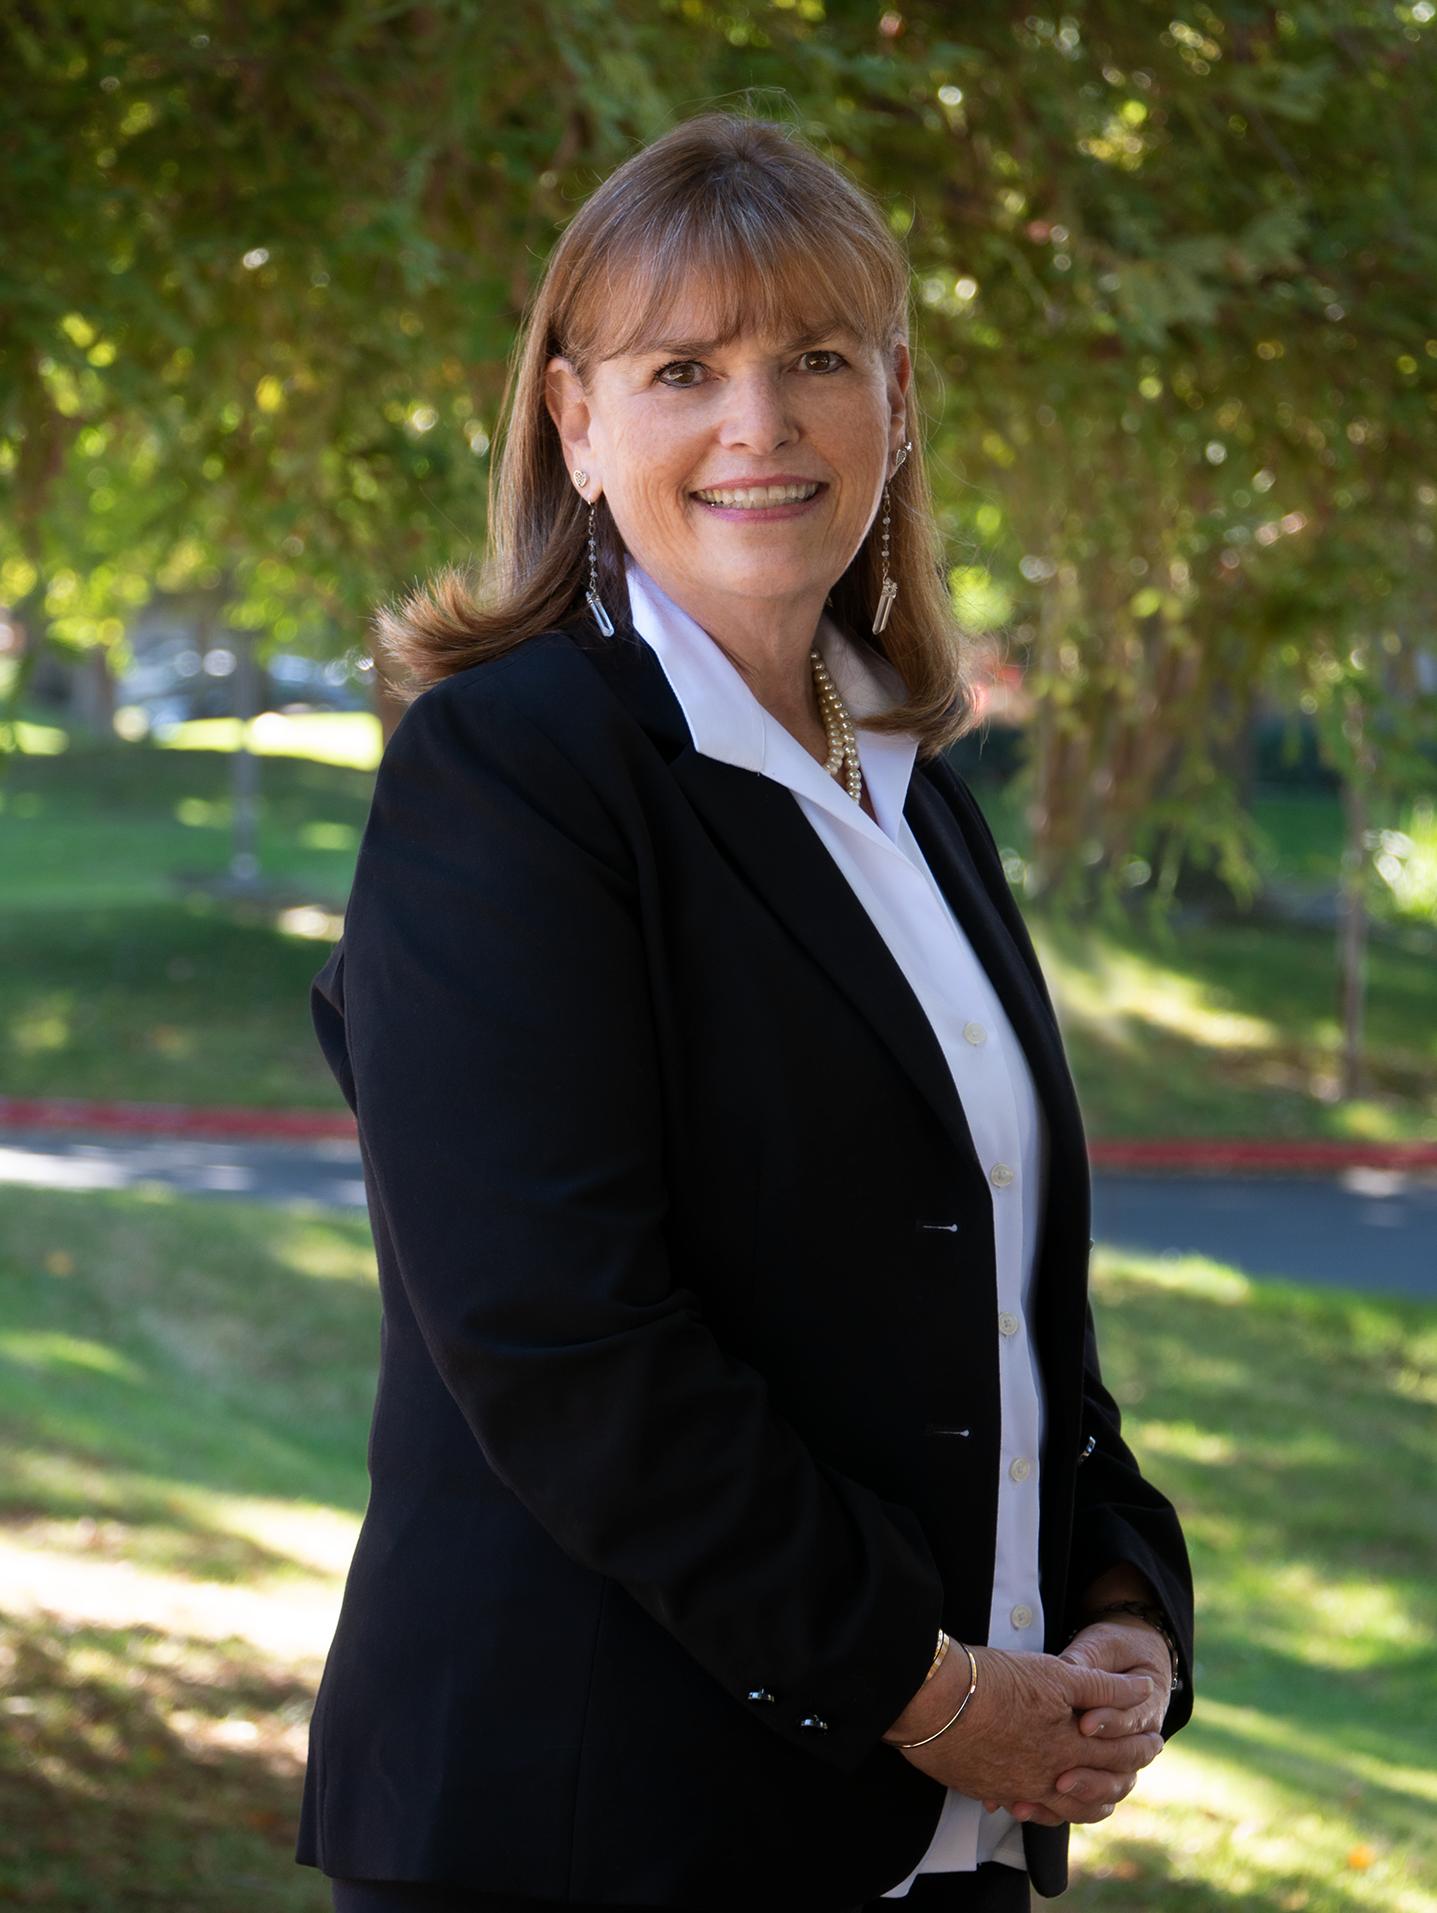 Melanie Peterson-Katz